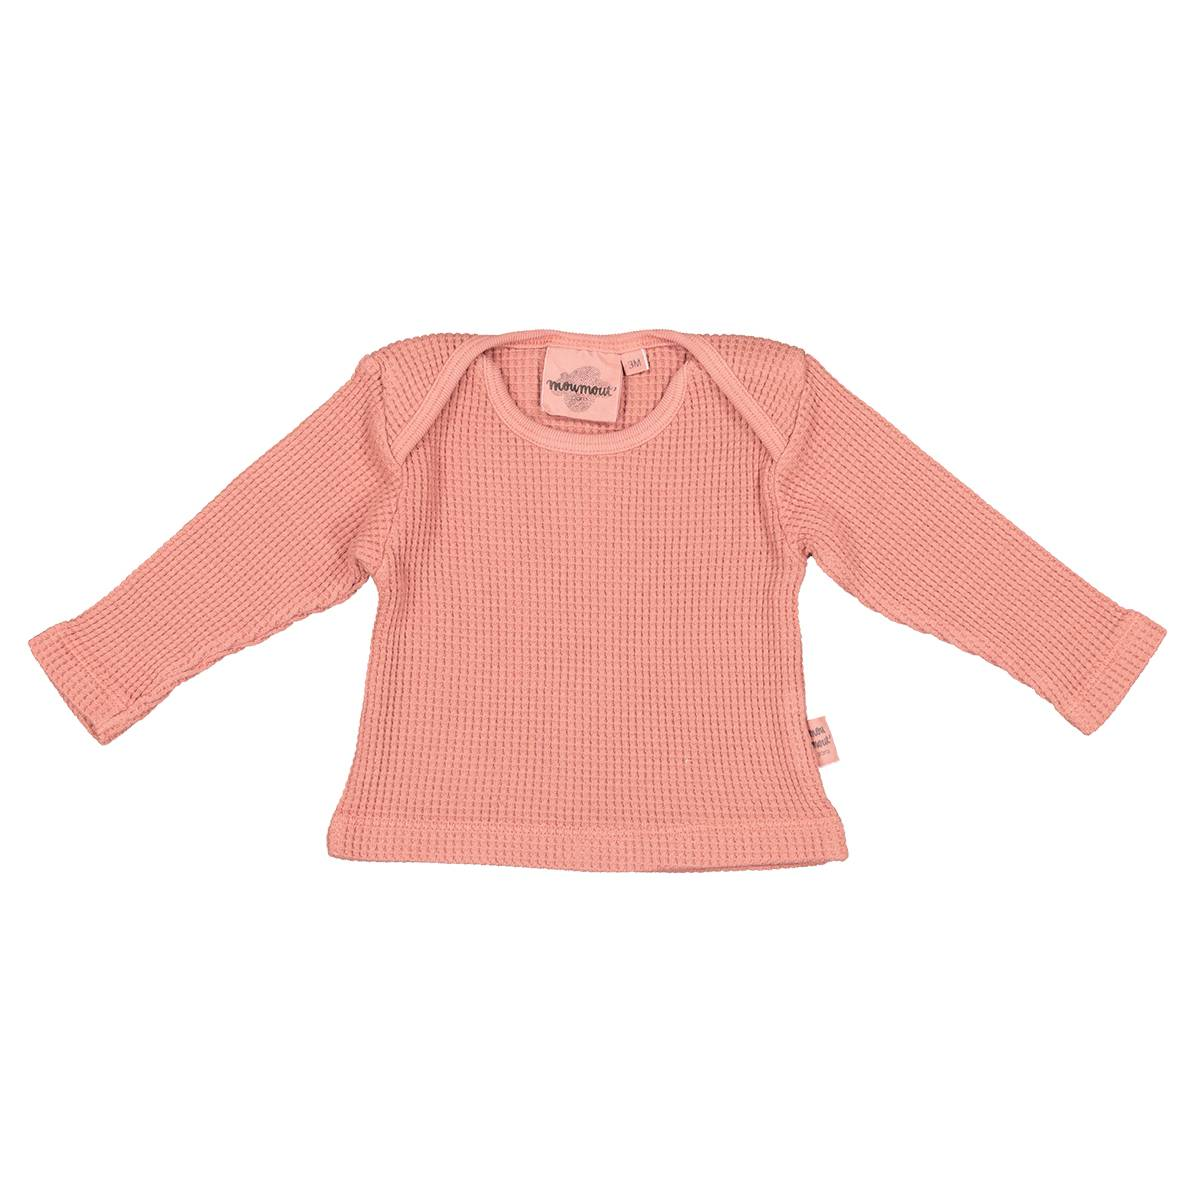 Moumout Tee-shirt Mü Bee Terracotta - 6 Mois